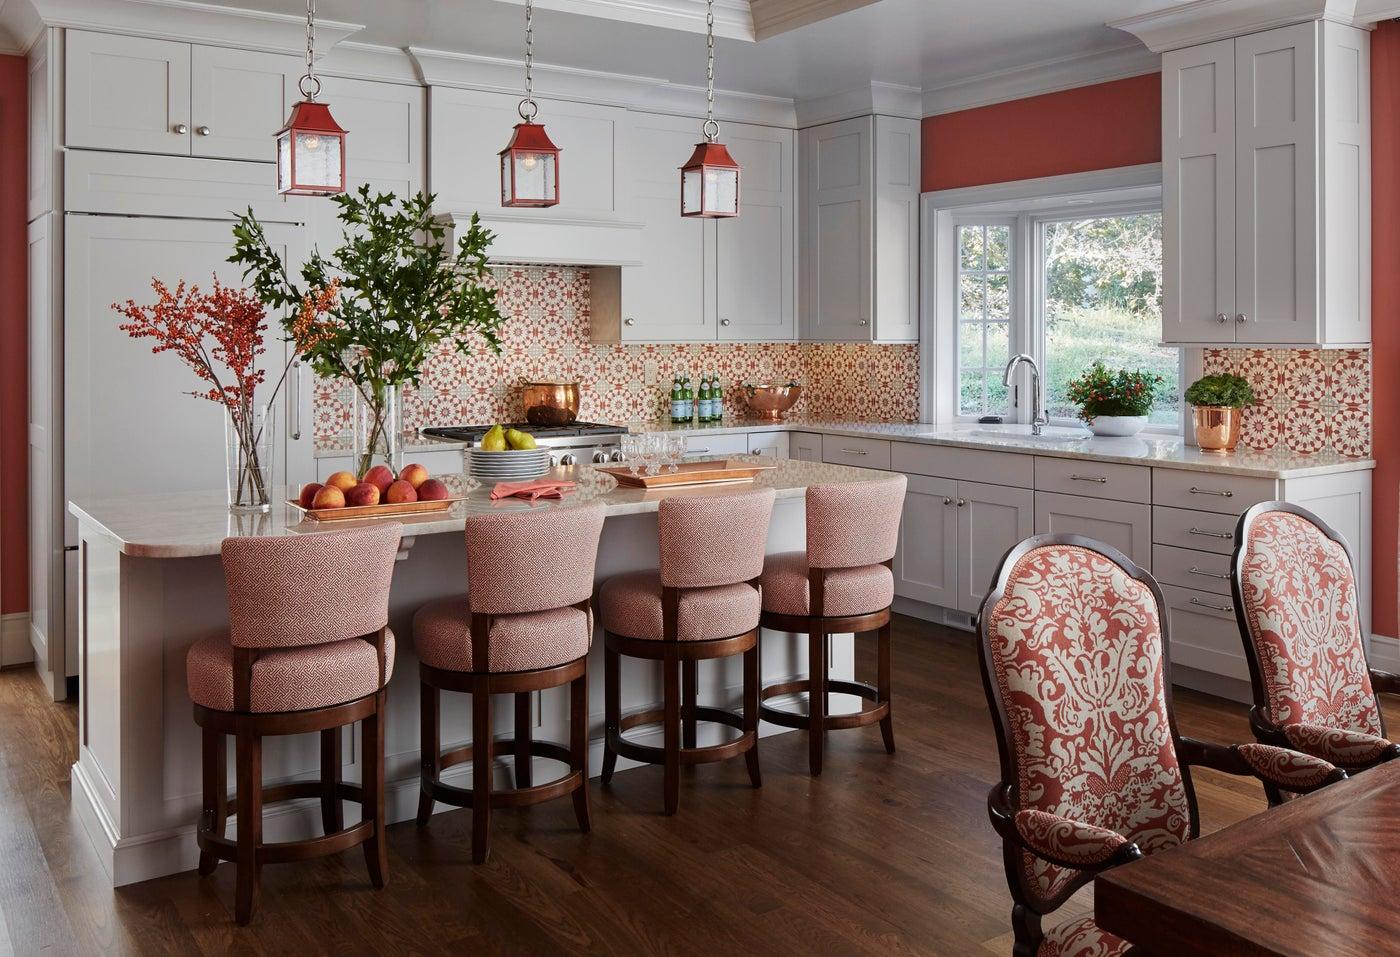 Gray, coral & orange kitchen area with red lantern pendants. Concrete splash